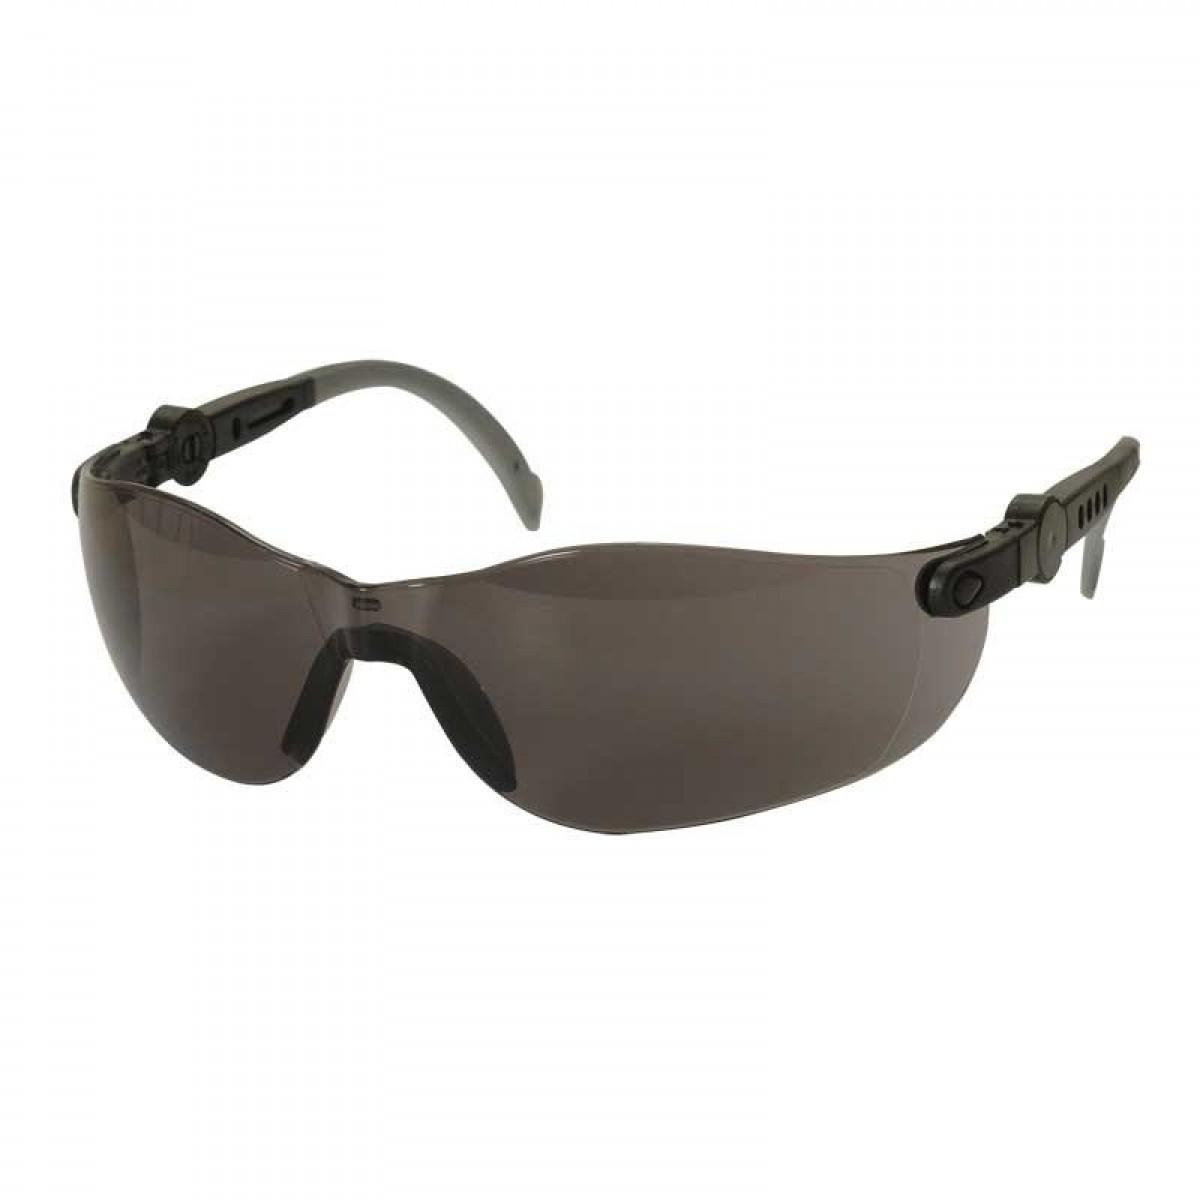 Beskyttelsesbrille OX-ON Space Dark-31